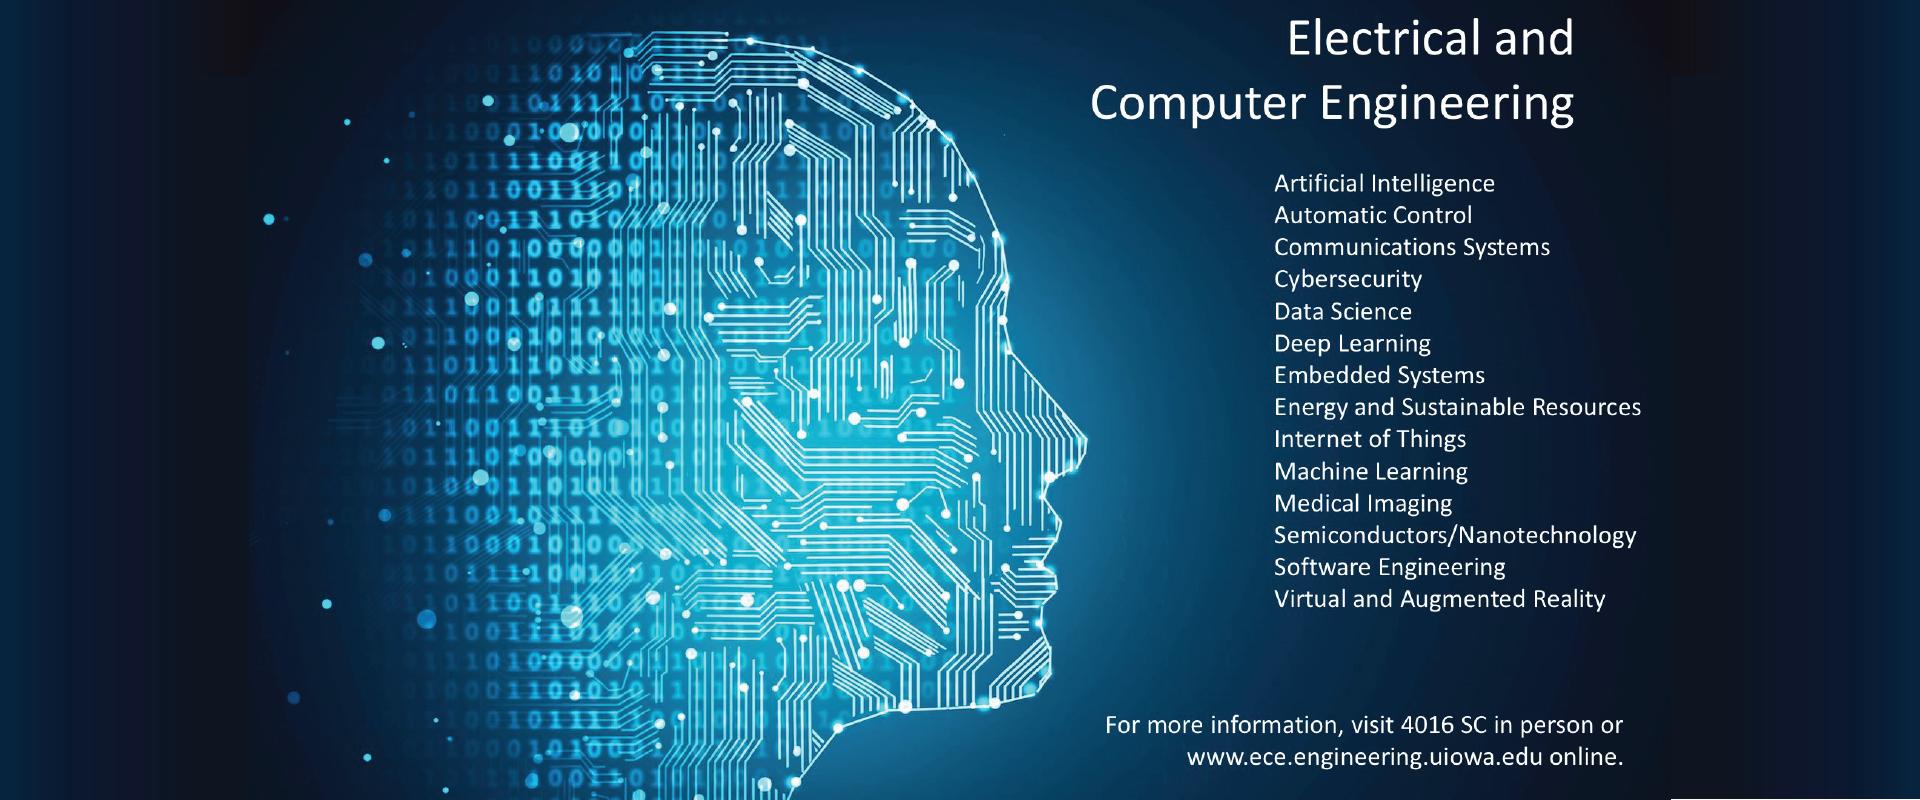 Electrical and Computer Engineering Department Slide UIOWA